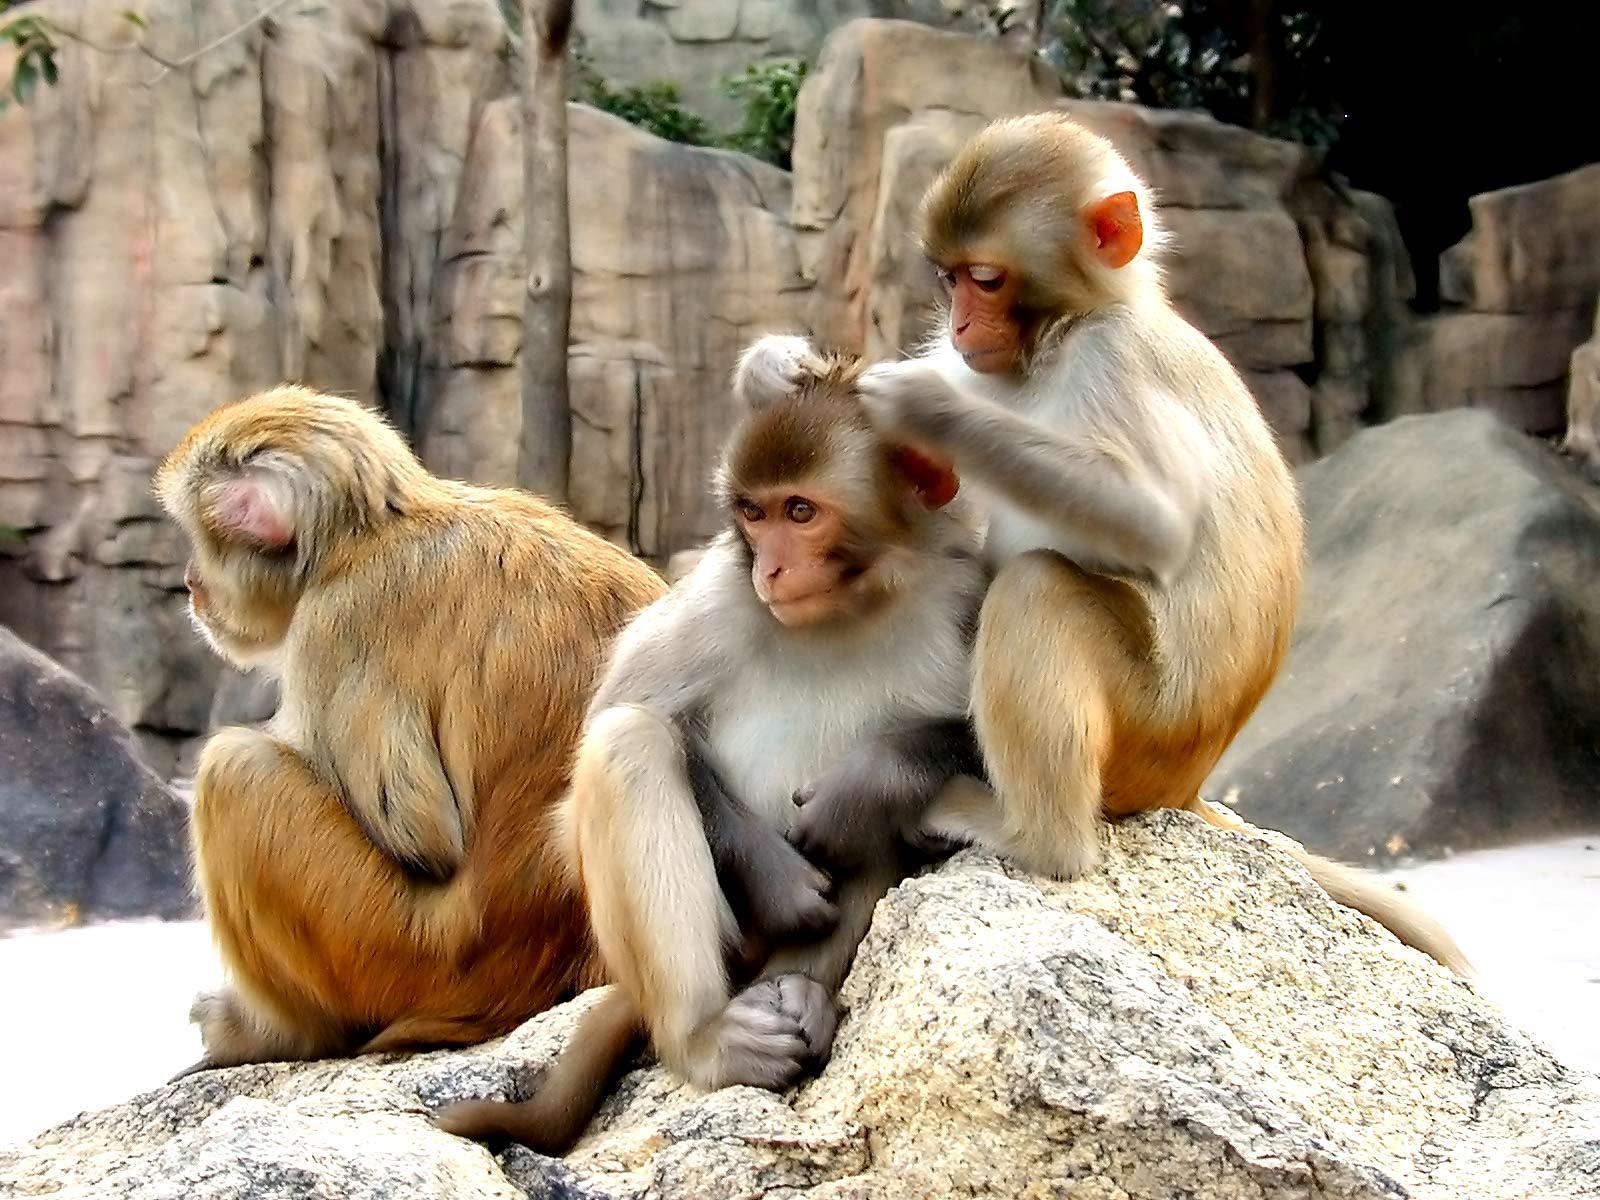 http://4.bp.blogspot.com/-prDReYG0RAU/UC_BvnnVCkI/AAAAAAAAJtc/OKYIFoWkyhA/s1600/Monkey+HD+Wallpapers+%282%29.jpg